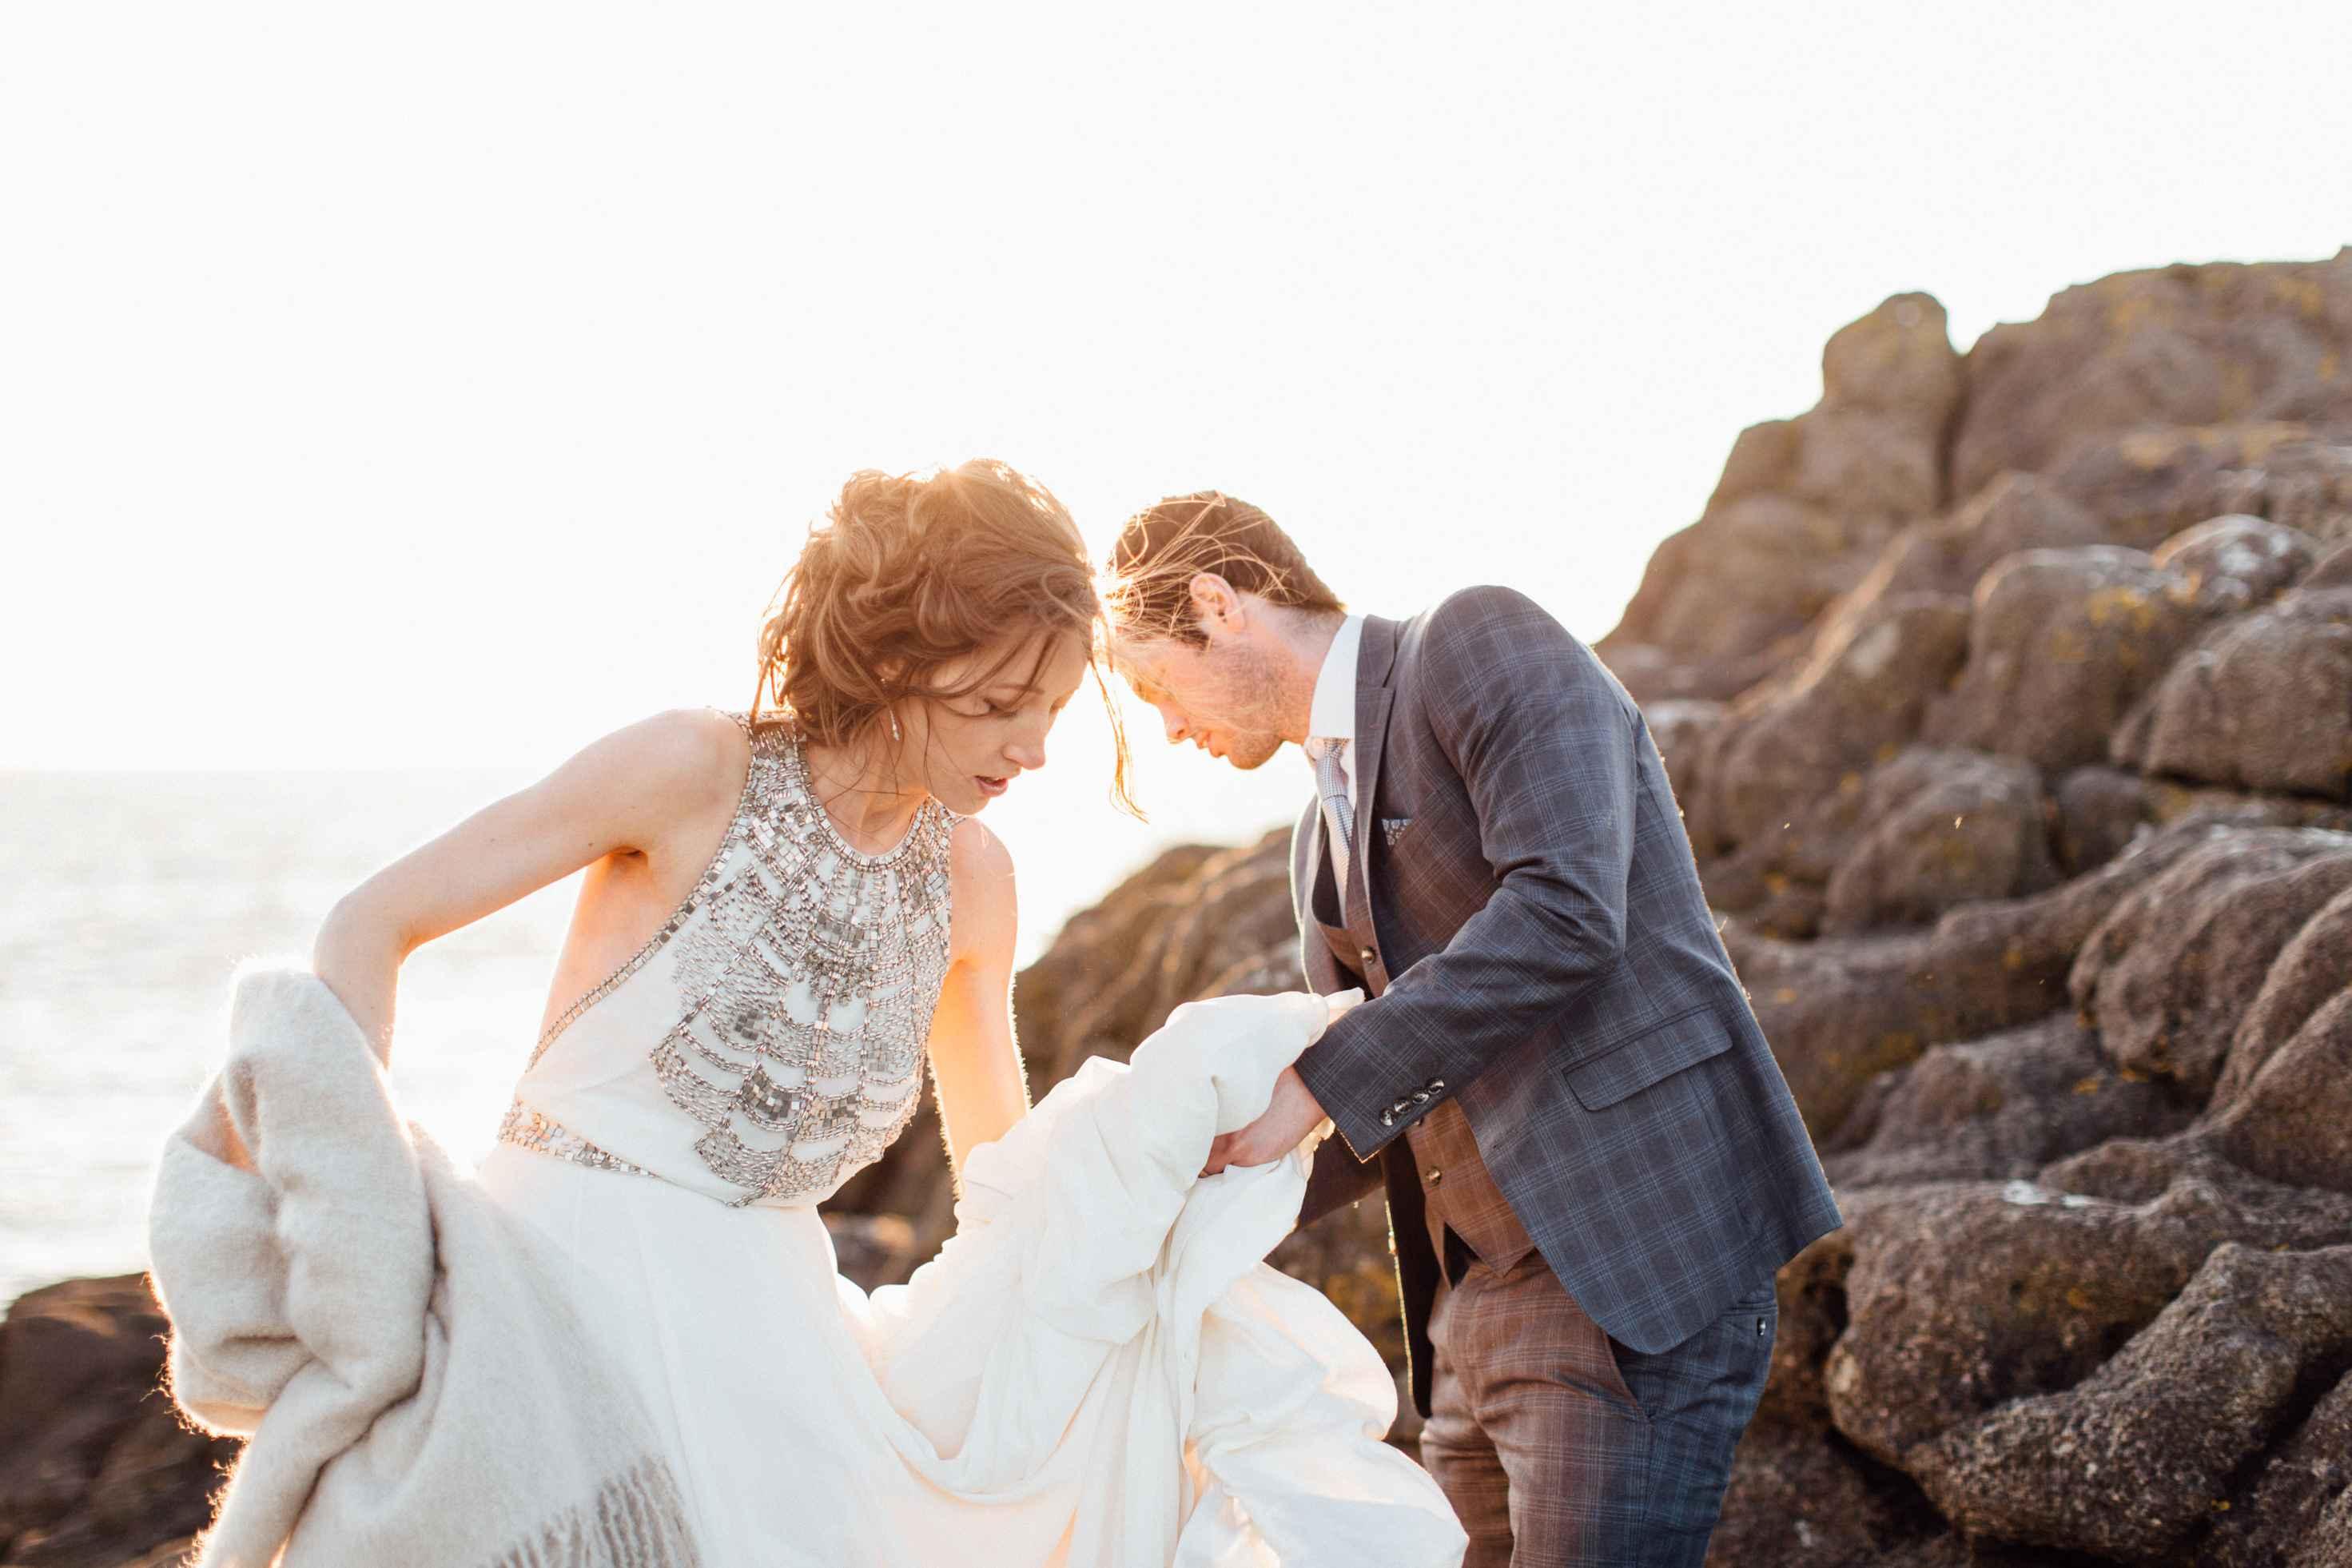 peter-carvill-weddings-fine-art-white-rocks-beach_0188